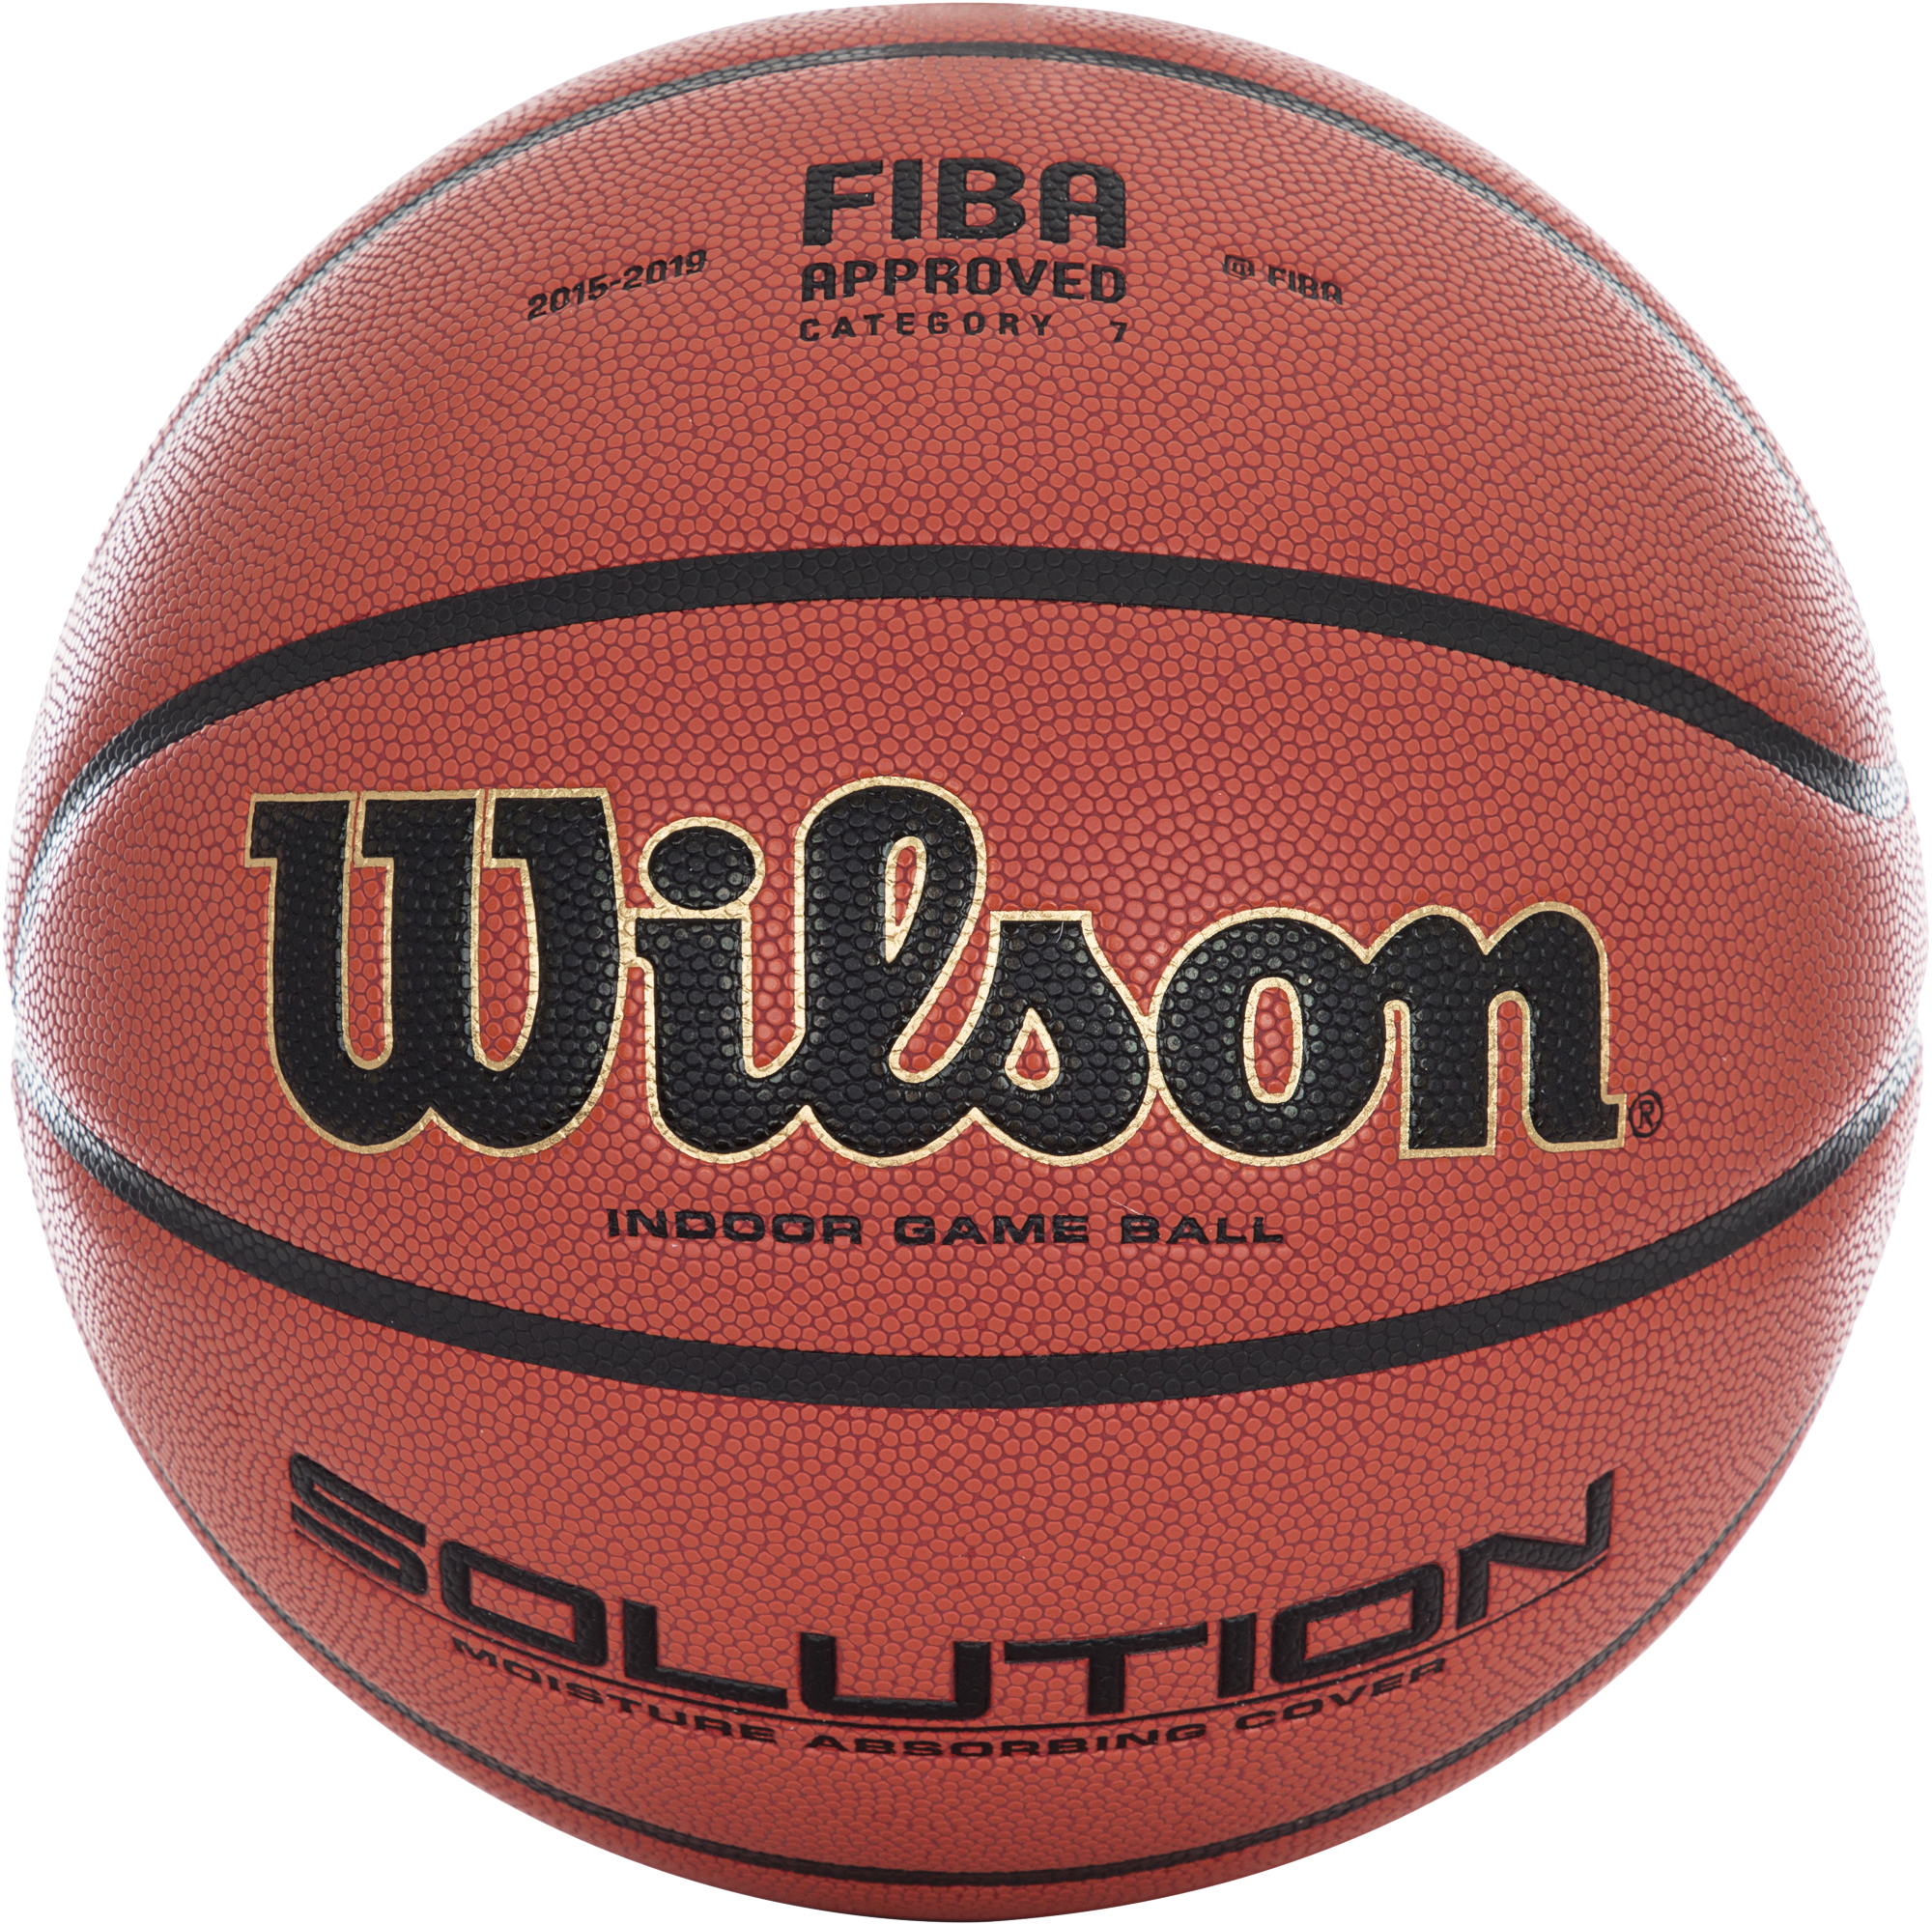 Wilson Мяч баскетбольный Wilson SOLUTION OFFICIAL GAME BALL все цены